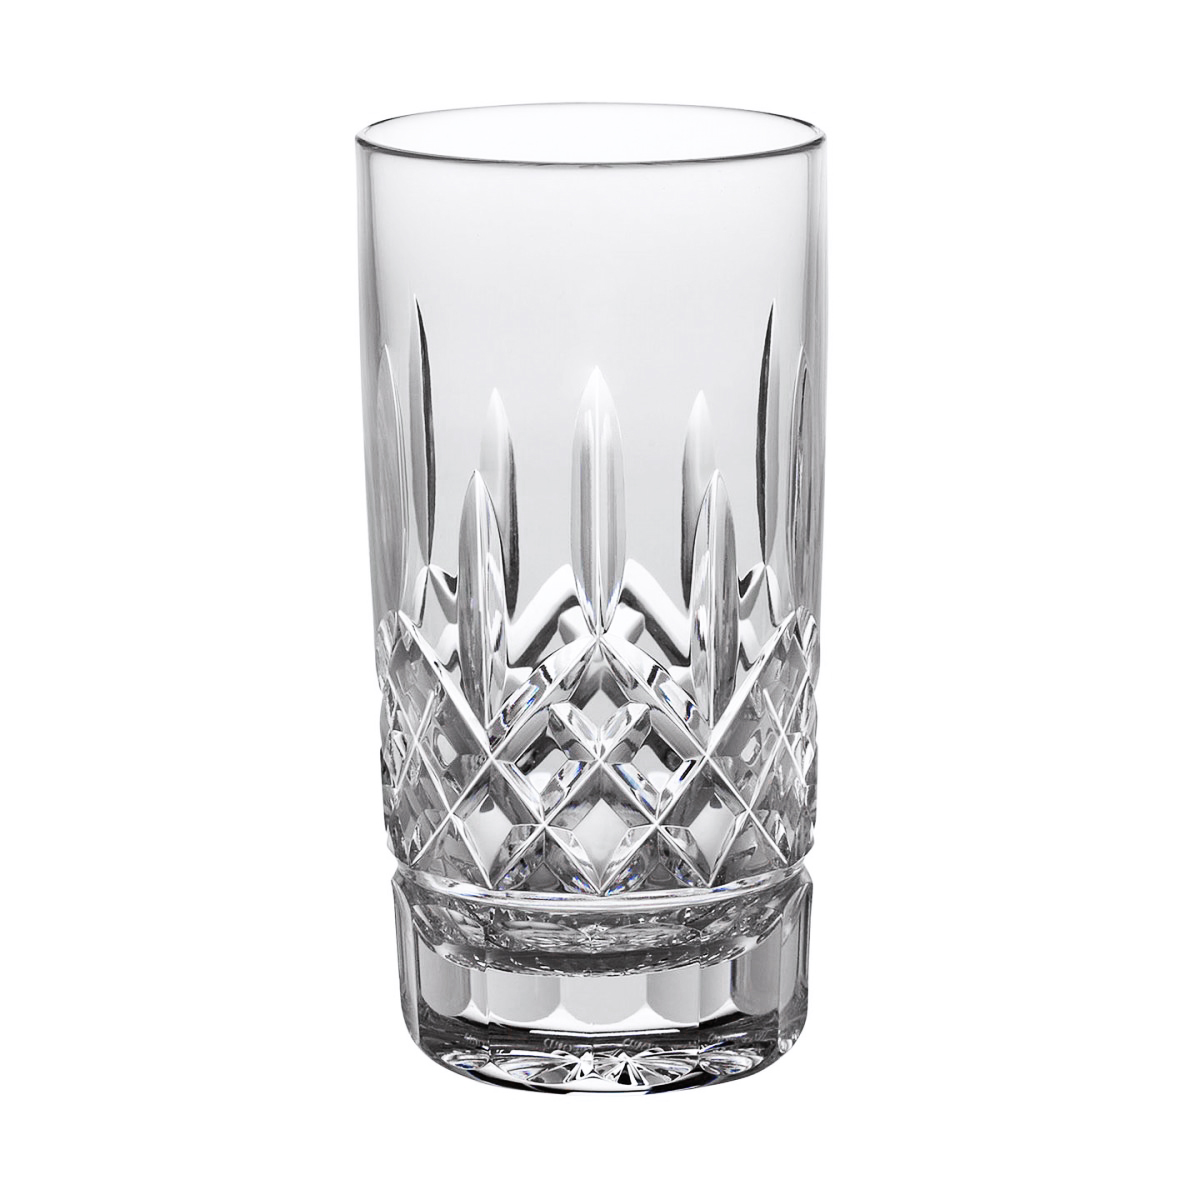 Waterford Crystal, Lismore 12 oz. Hiball Tumbler, Single